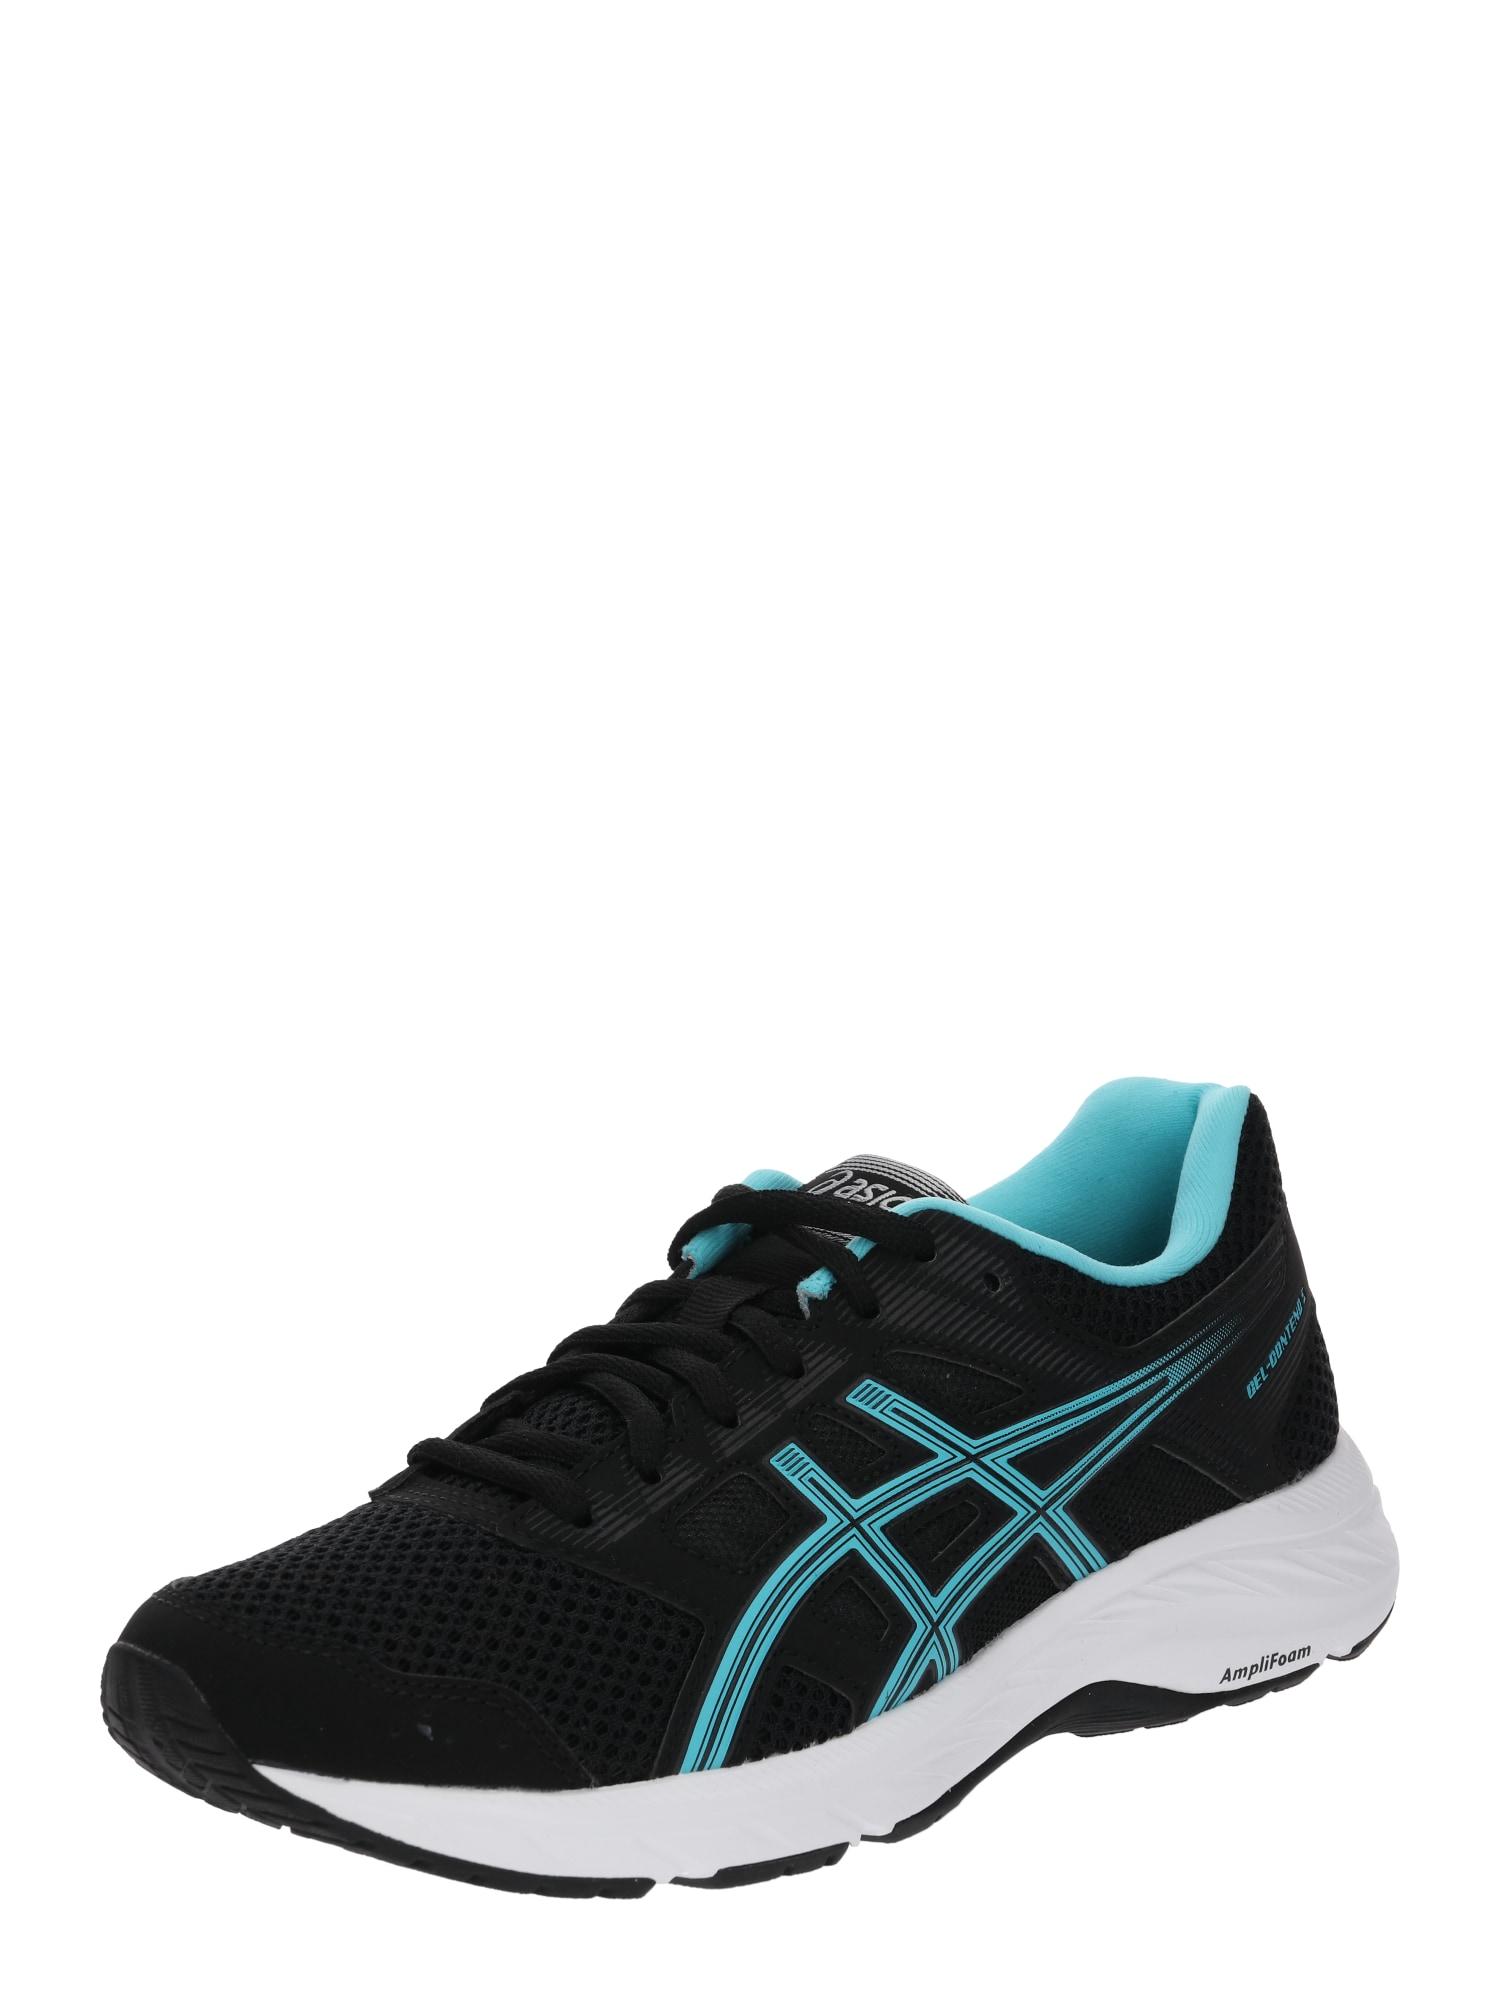 Běžecká obuv Gel-Contend 5 světlemodrá černá ASICS